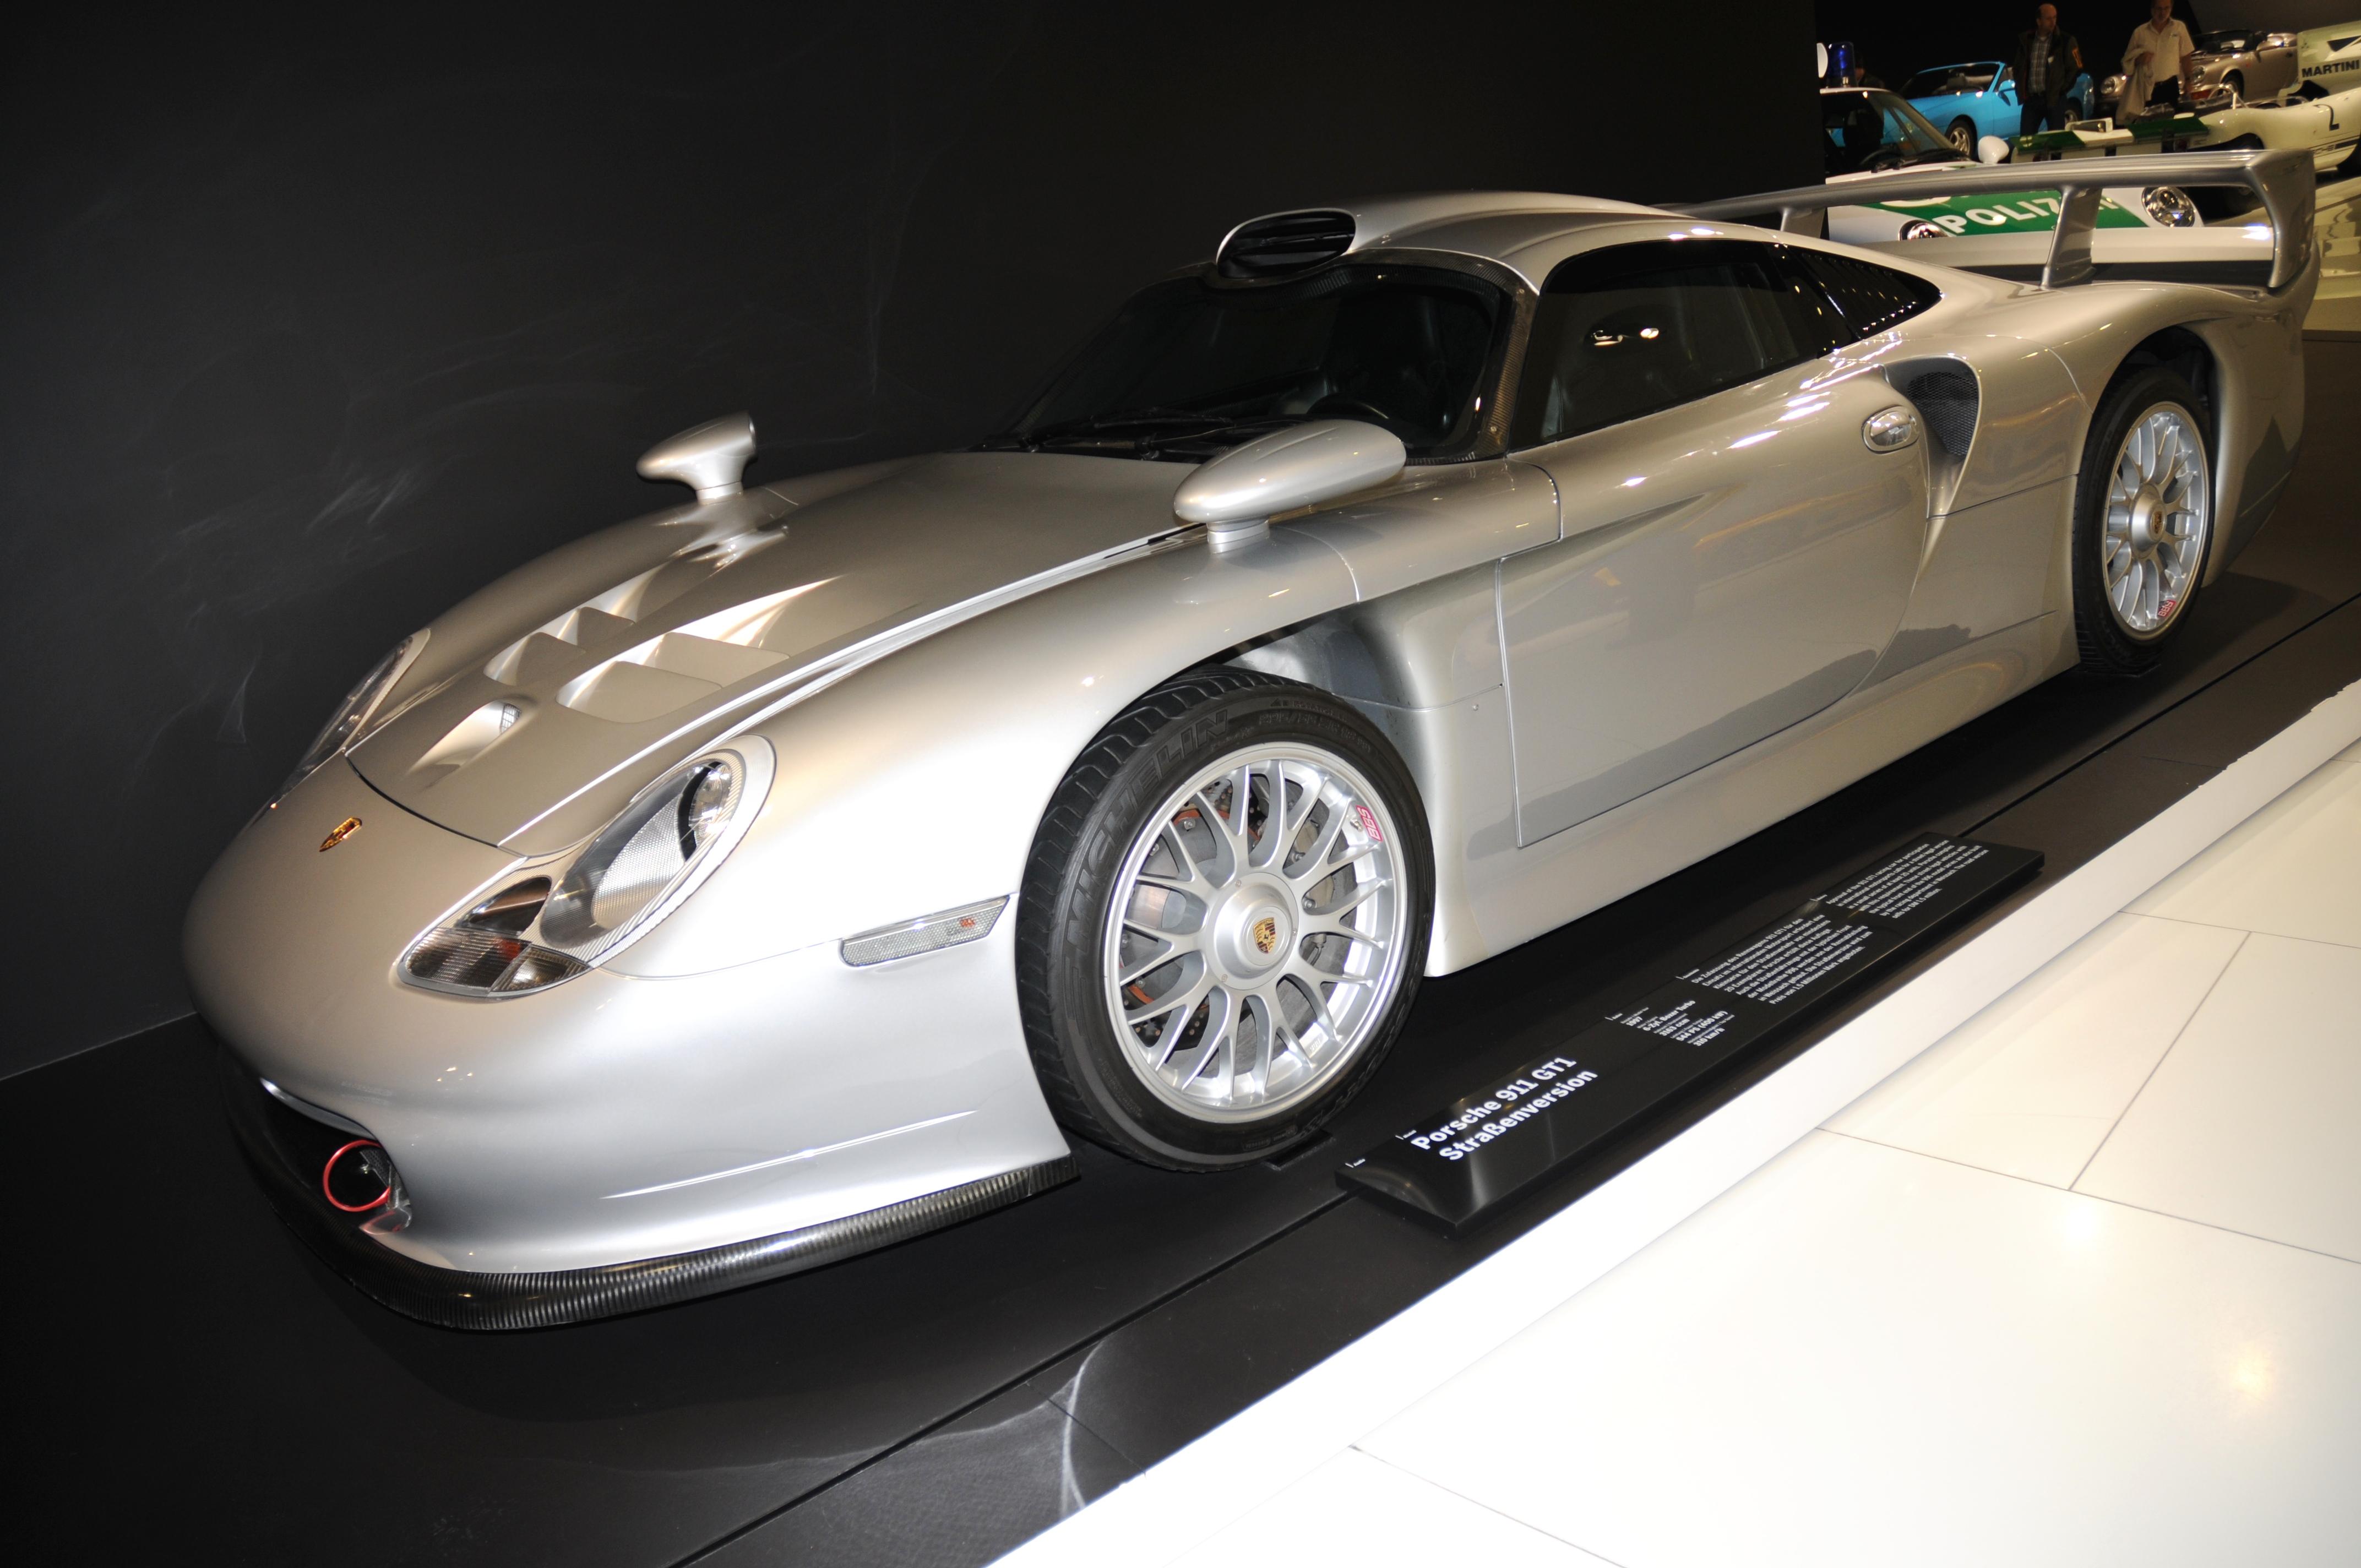 dsc_5319 Inspiring Porsche 911 Gt1 Road atlanta Cars Trend